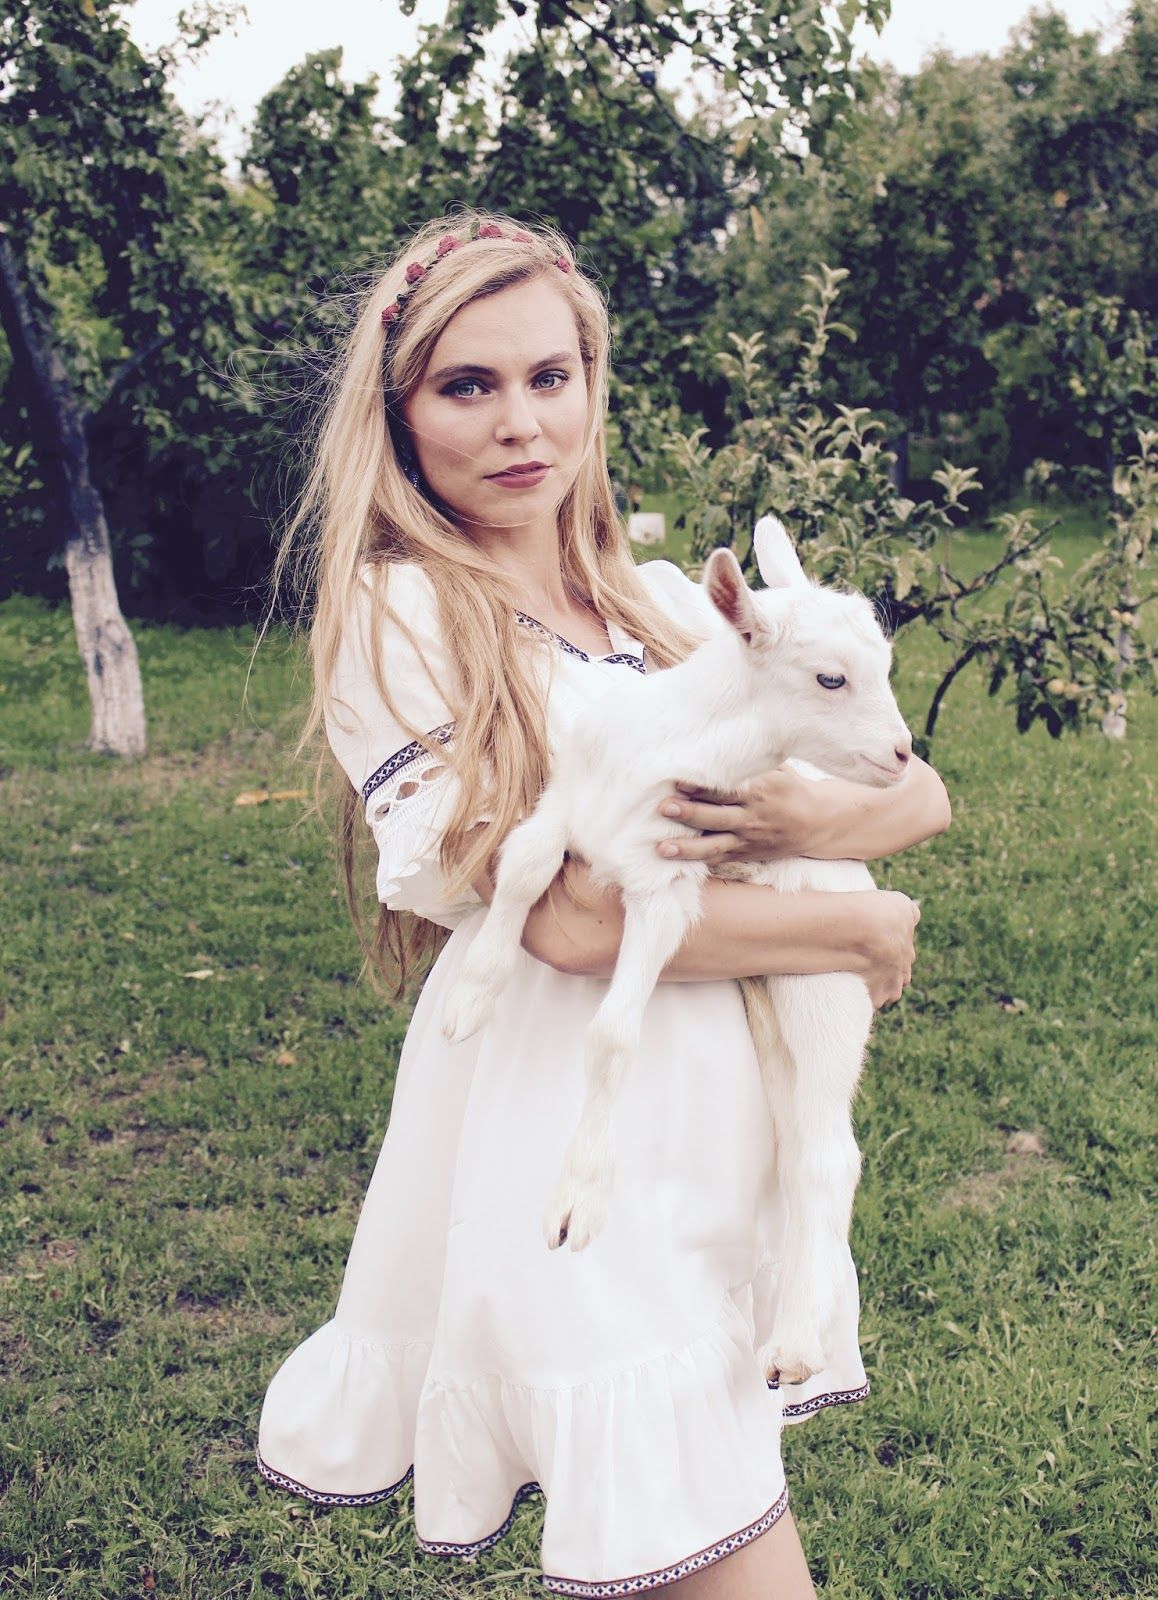 #zaful#dress#outfits#summer#whitedress#goat#boho#style